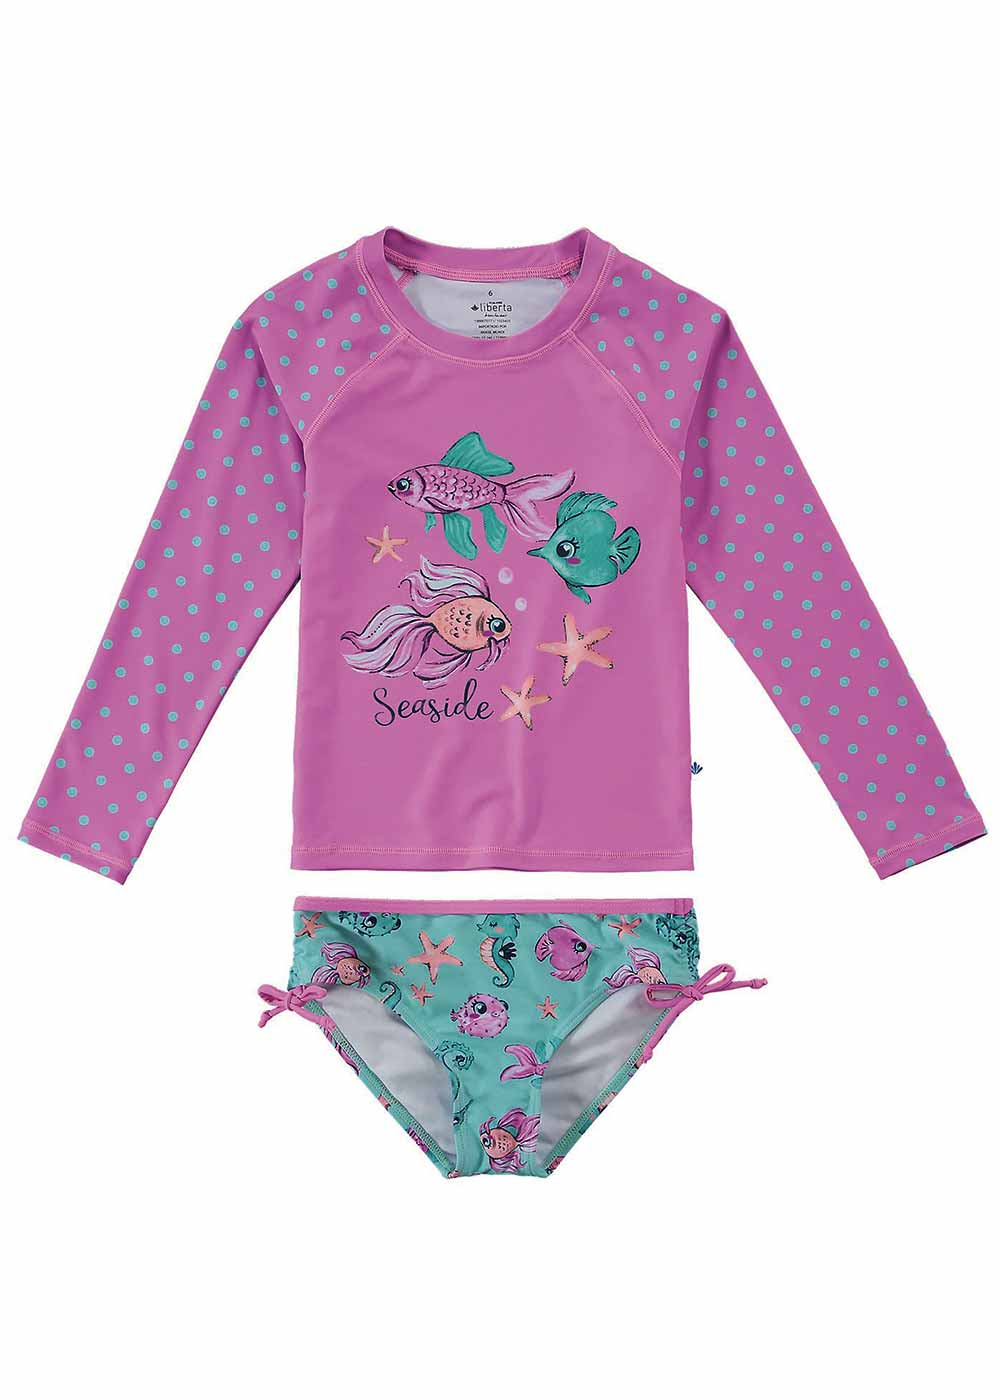 Biquini Infantil Proteção UV 50+ Rosa Seaside - Malwee